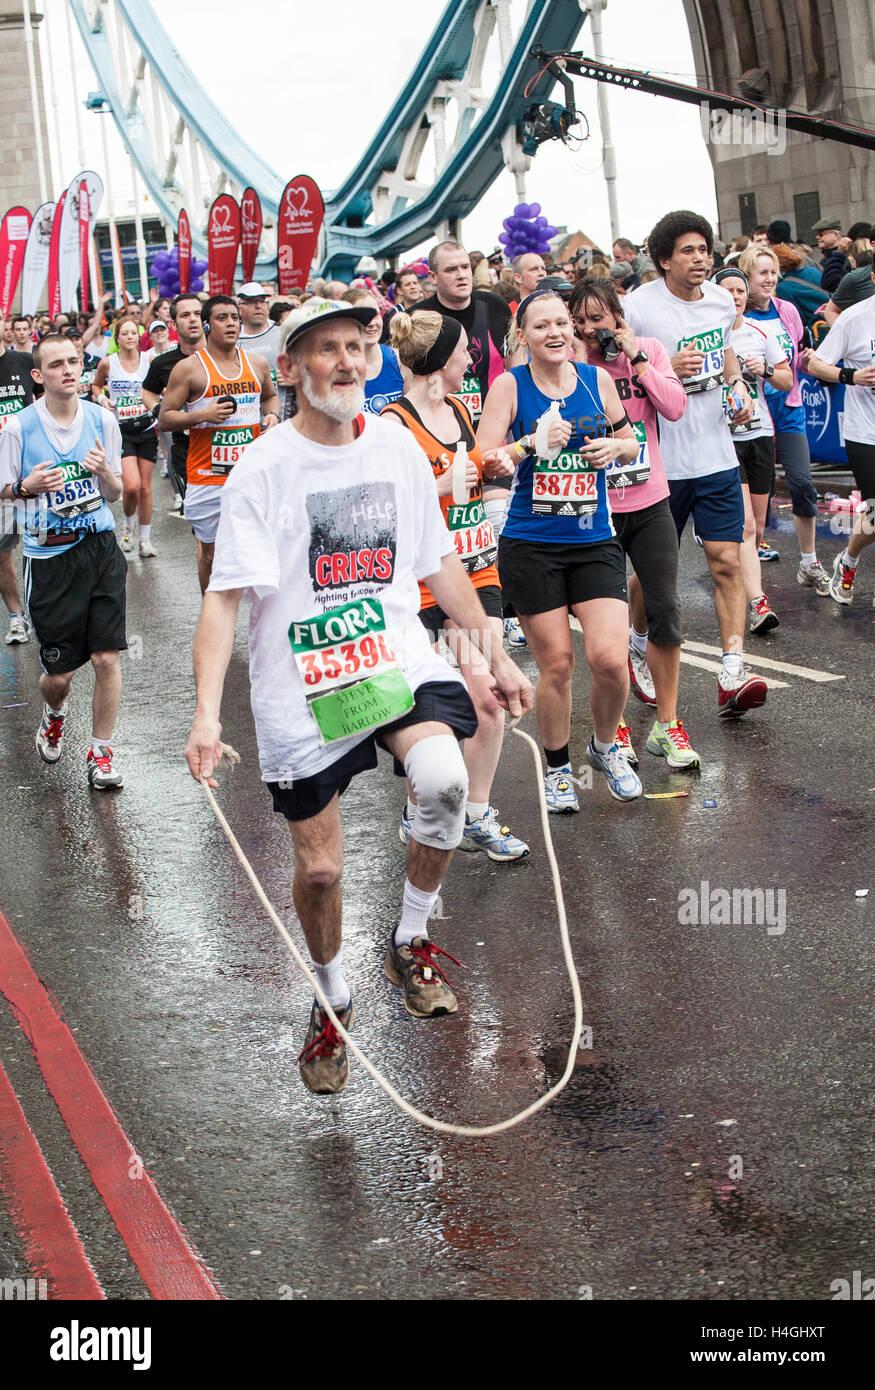 Runners participating running in iconic London Marathon,England. Mature,senior,old,mature,elder,elderly,man, skiipping - Stock Image